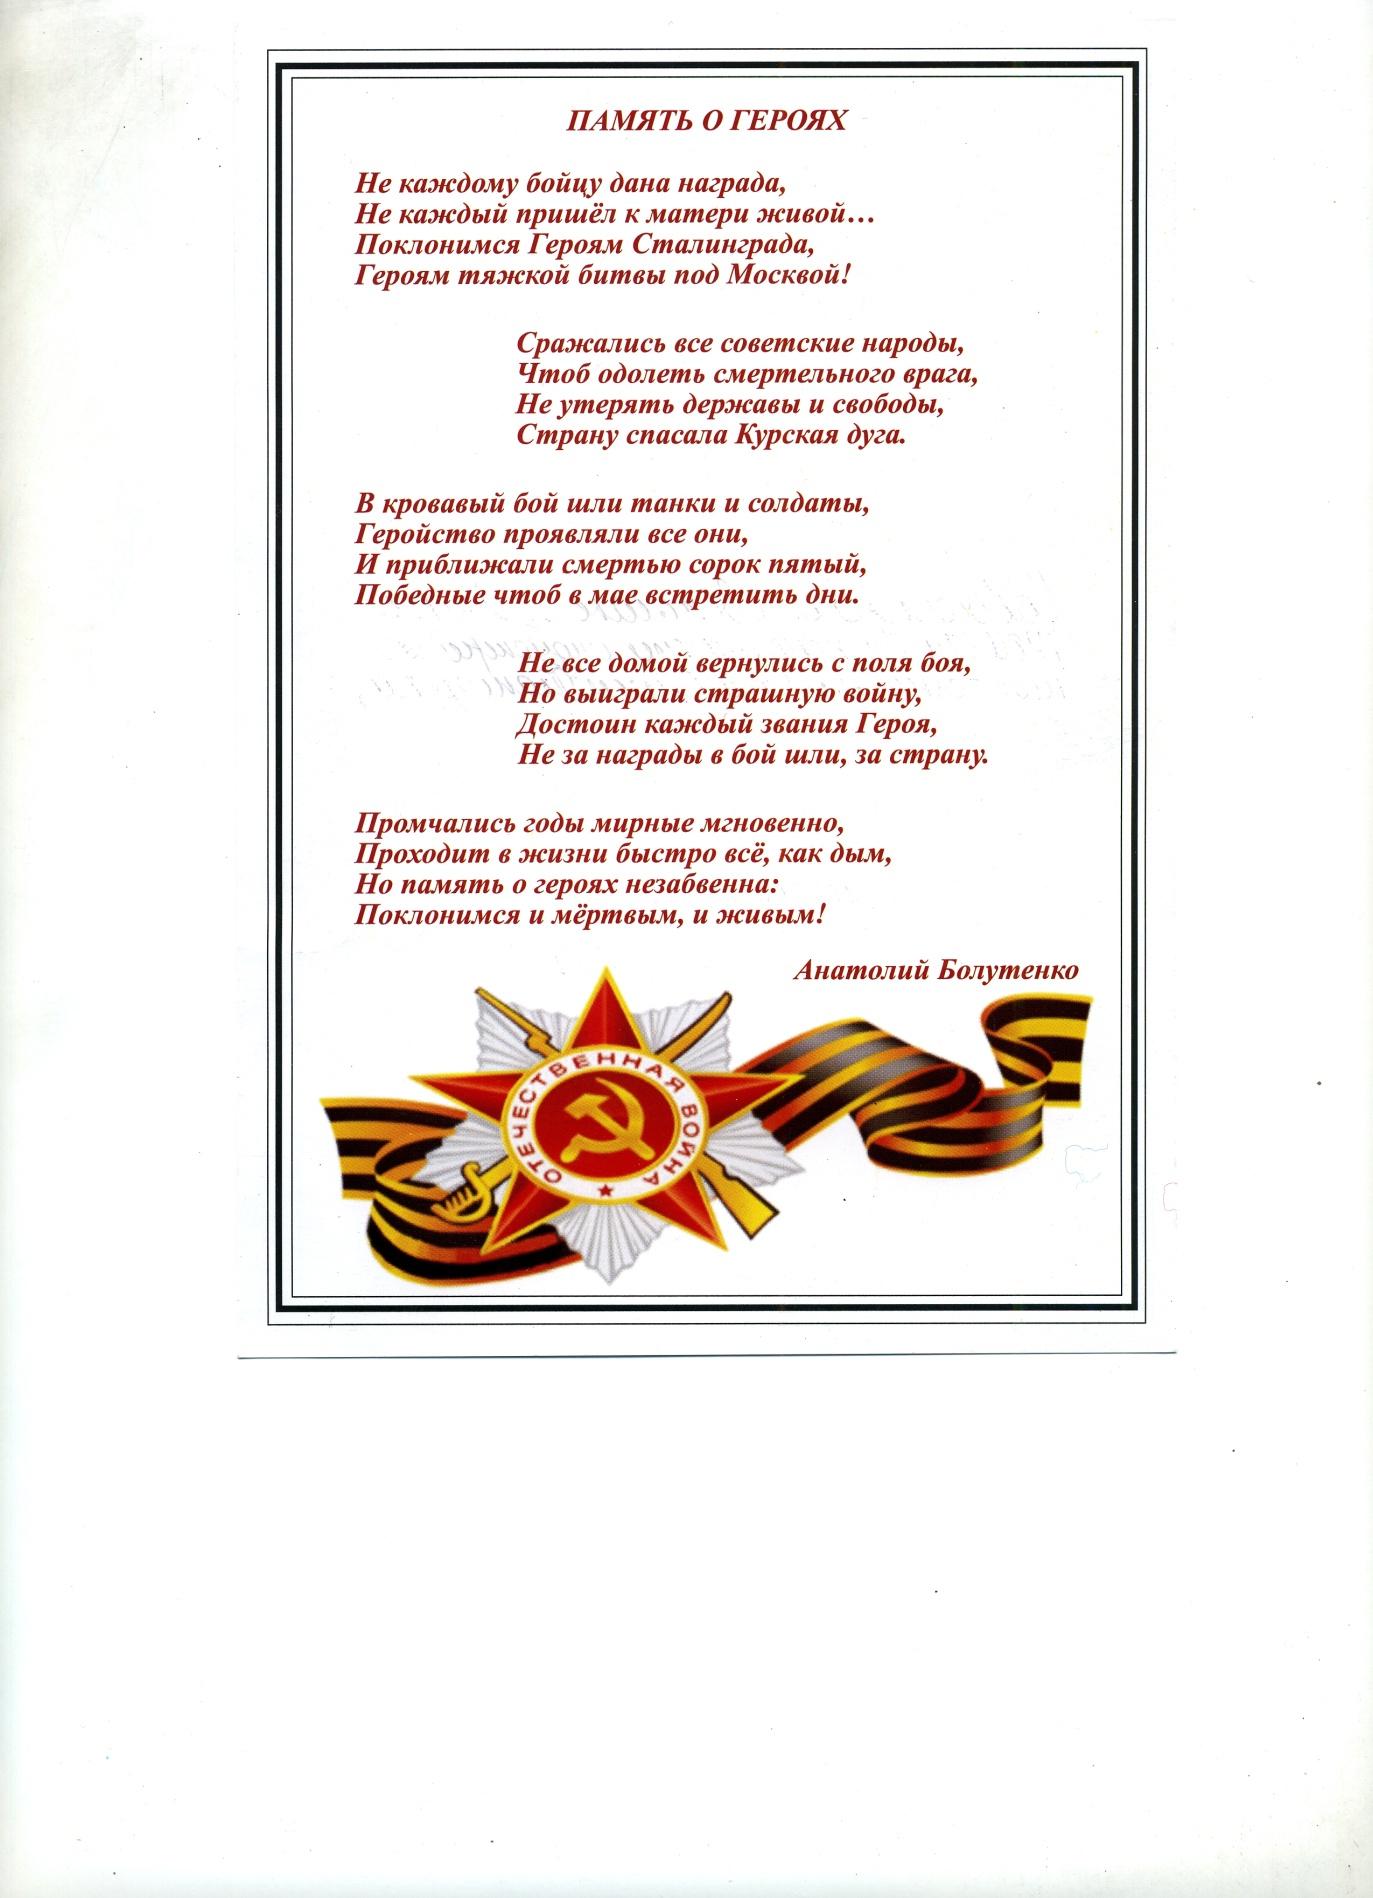 F:\Всероссйский конкурс Портфолио выпускника\РИММА\img763.jpg